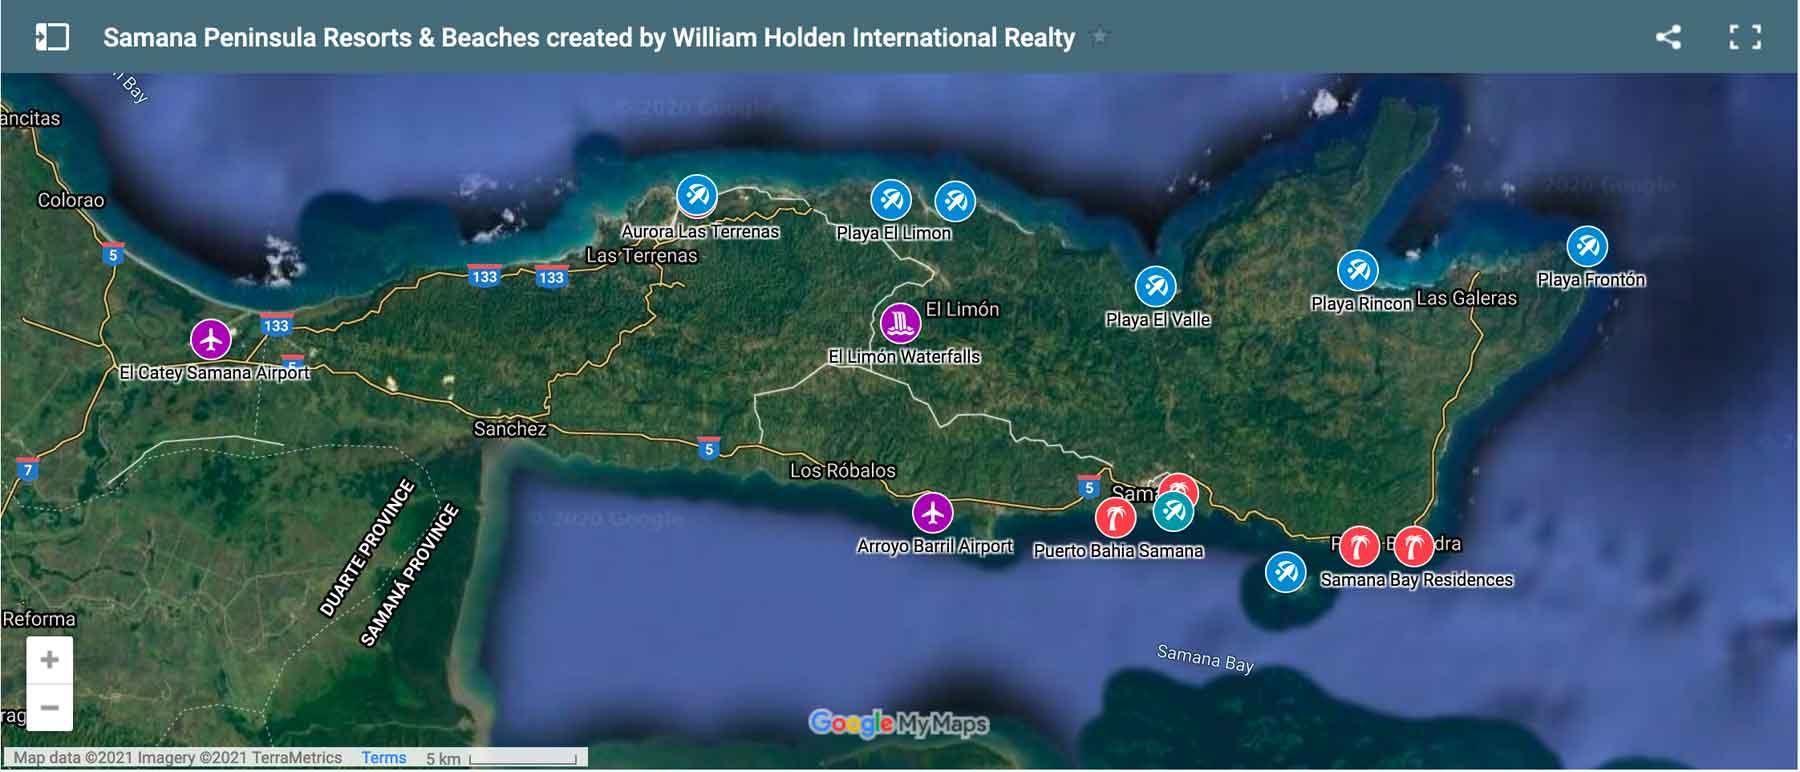 Map of Samana Bay Residences Resorts